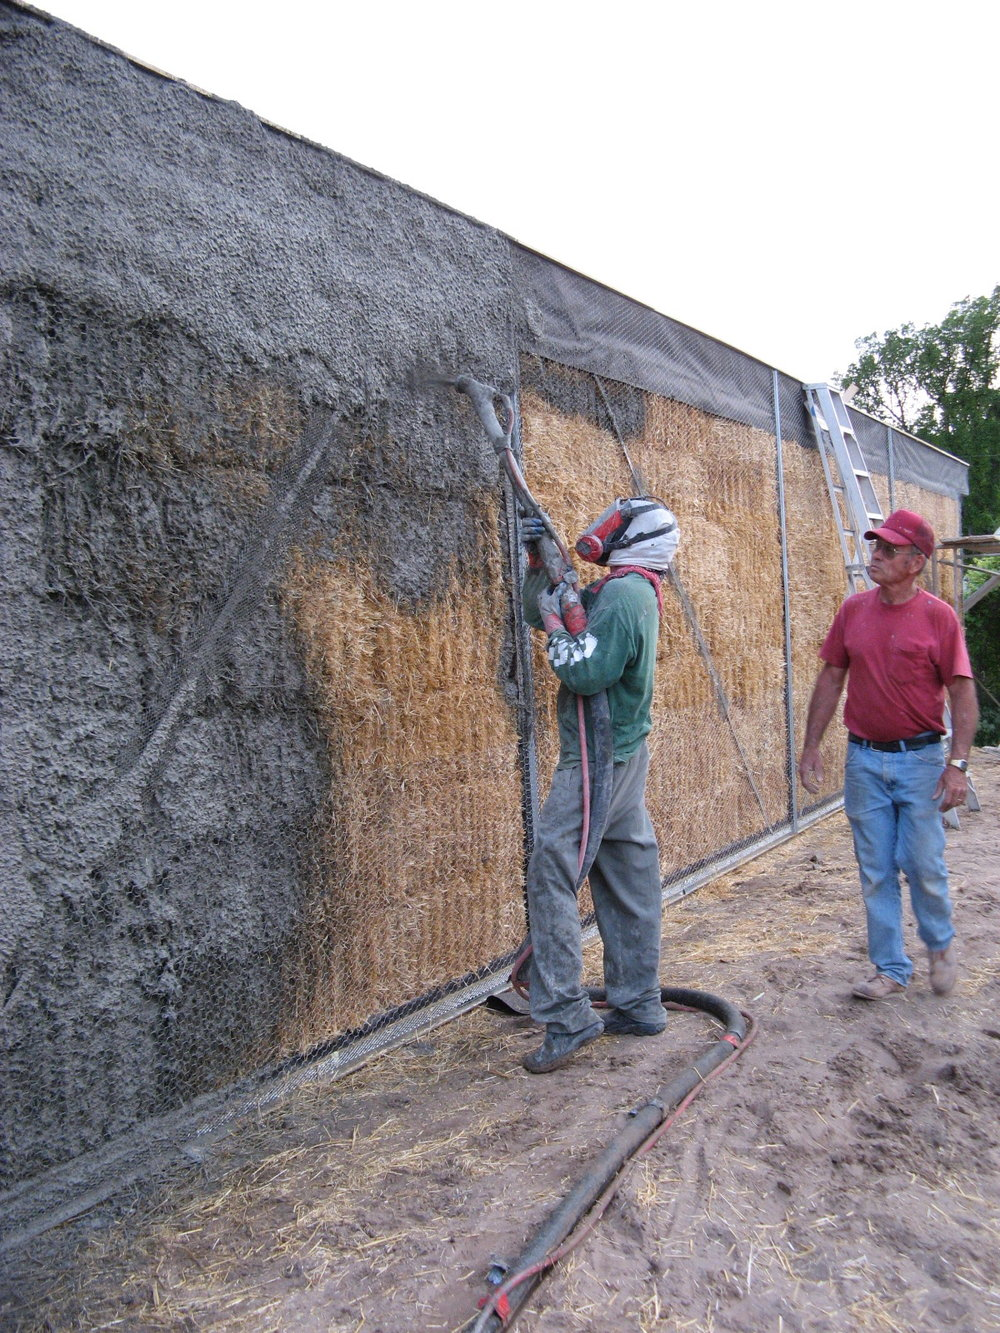 Tony starts spraying on the stucco